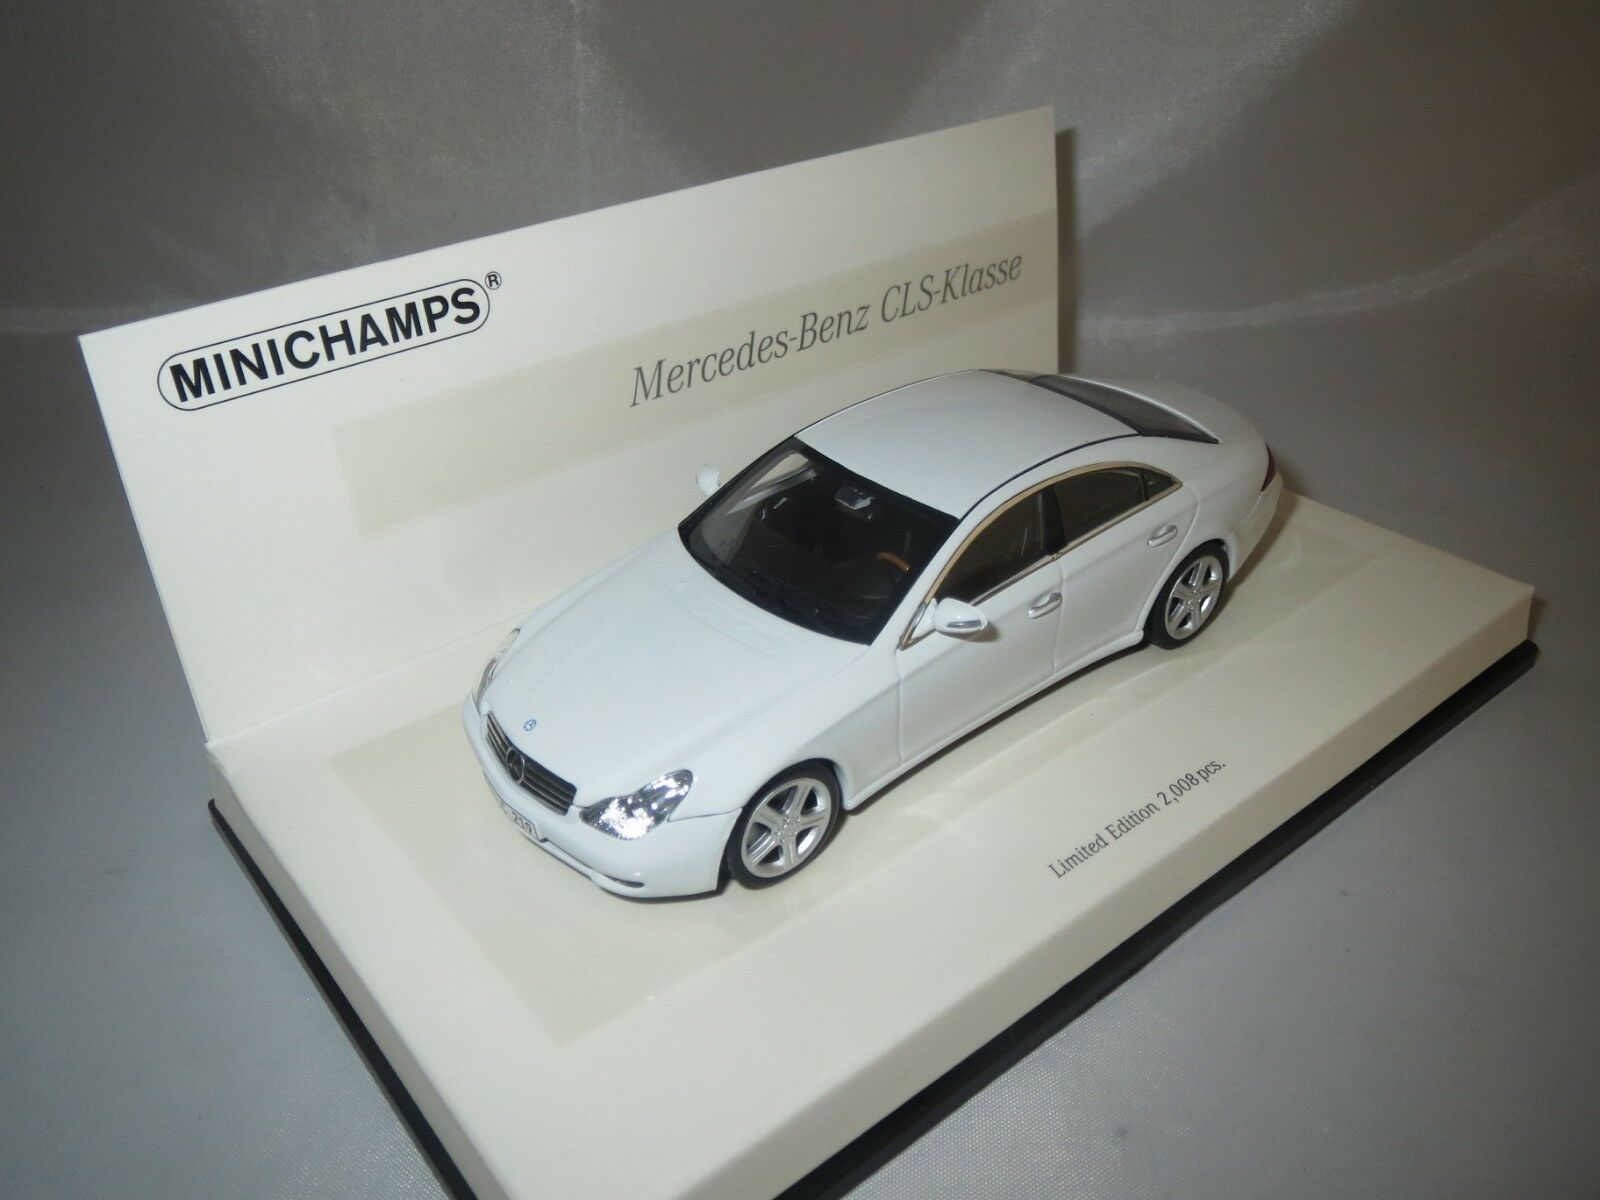 MINICHAMPS 436034300 436034300 436034300 Mercedes-Benz CLS-classe (2005) Linea Bianco 1 43 neuf dans sa boîte b57e9e